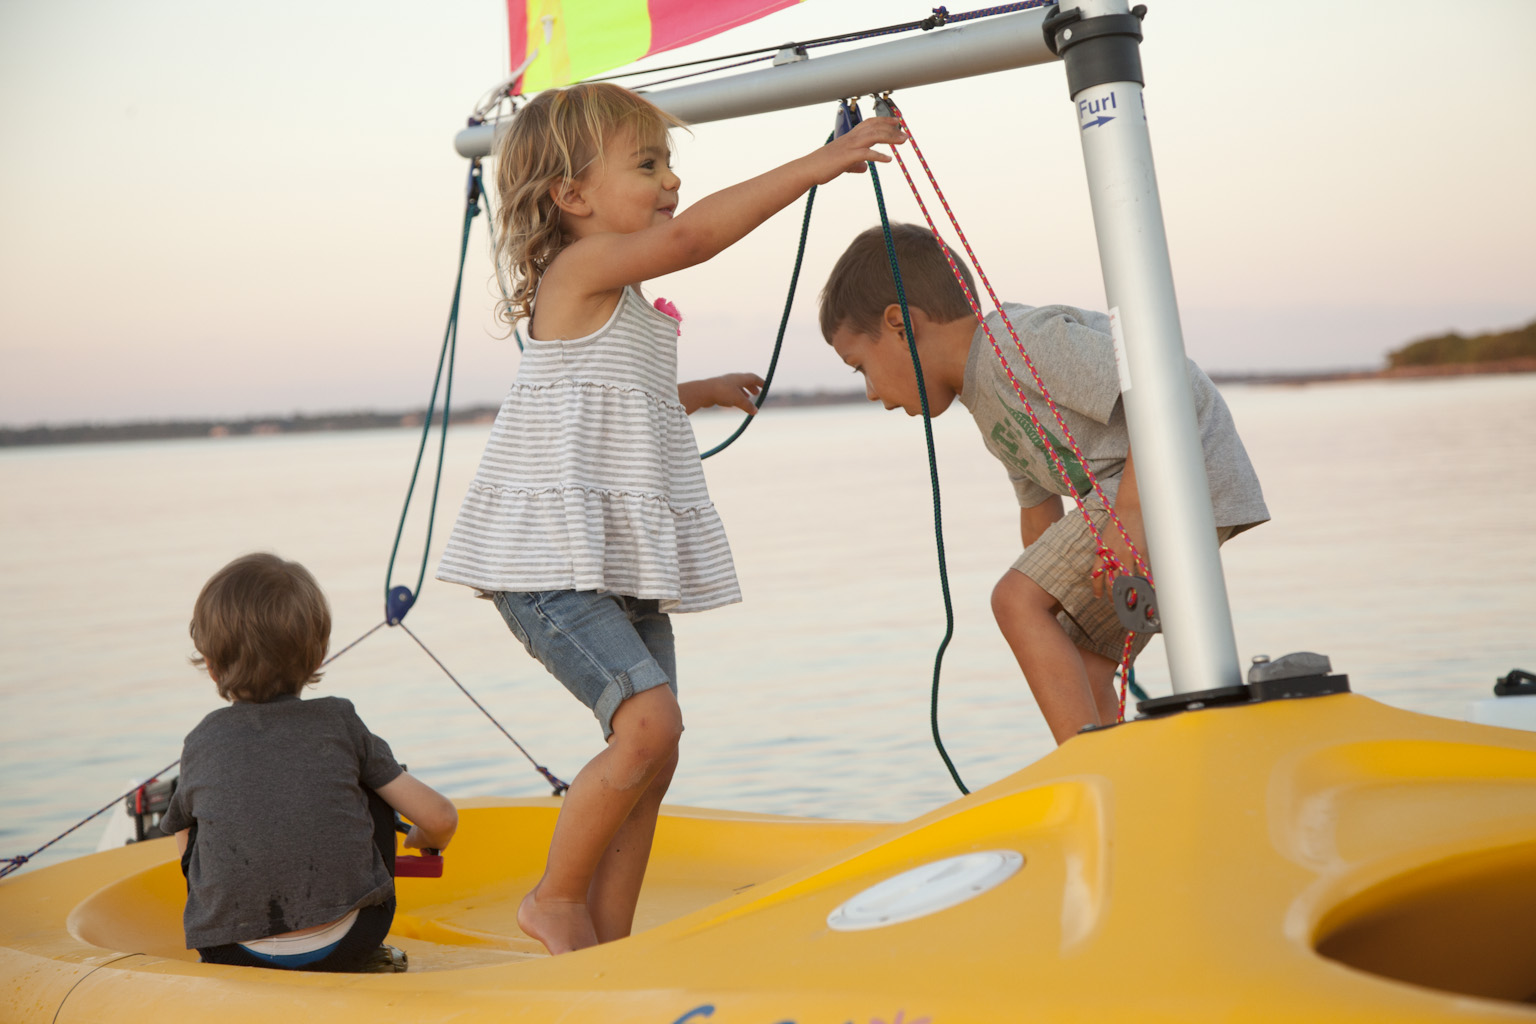 Funfboat am Strand als beliebter Kinderspielplatz